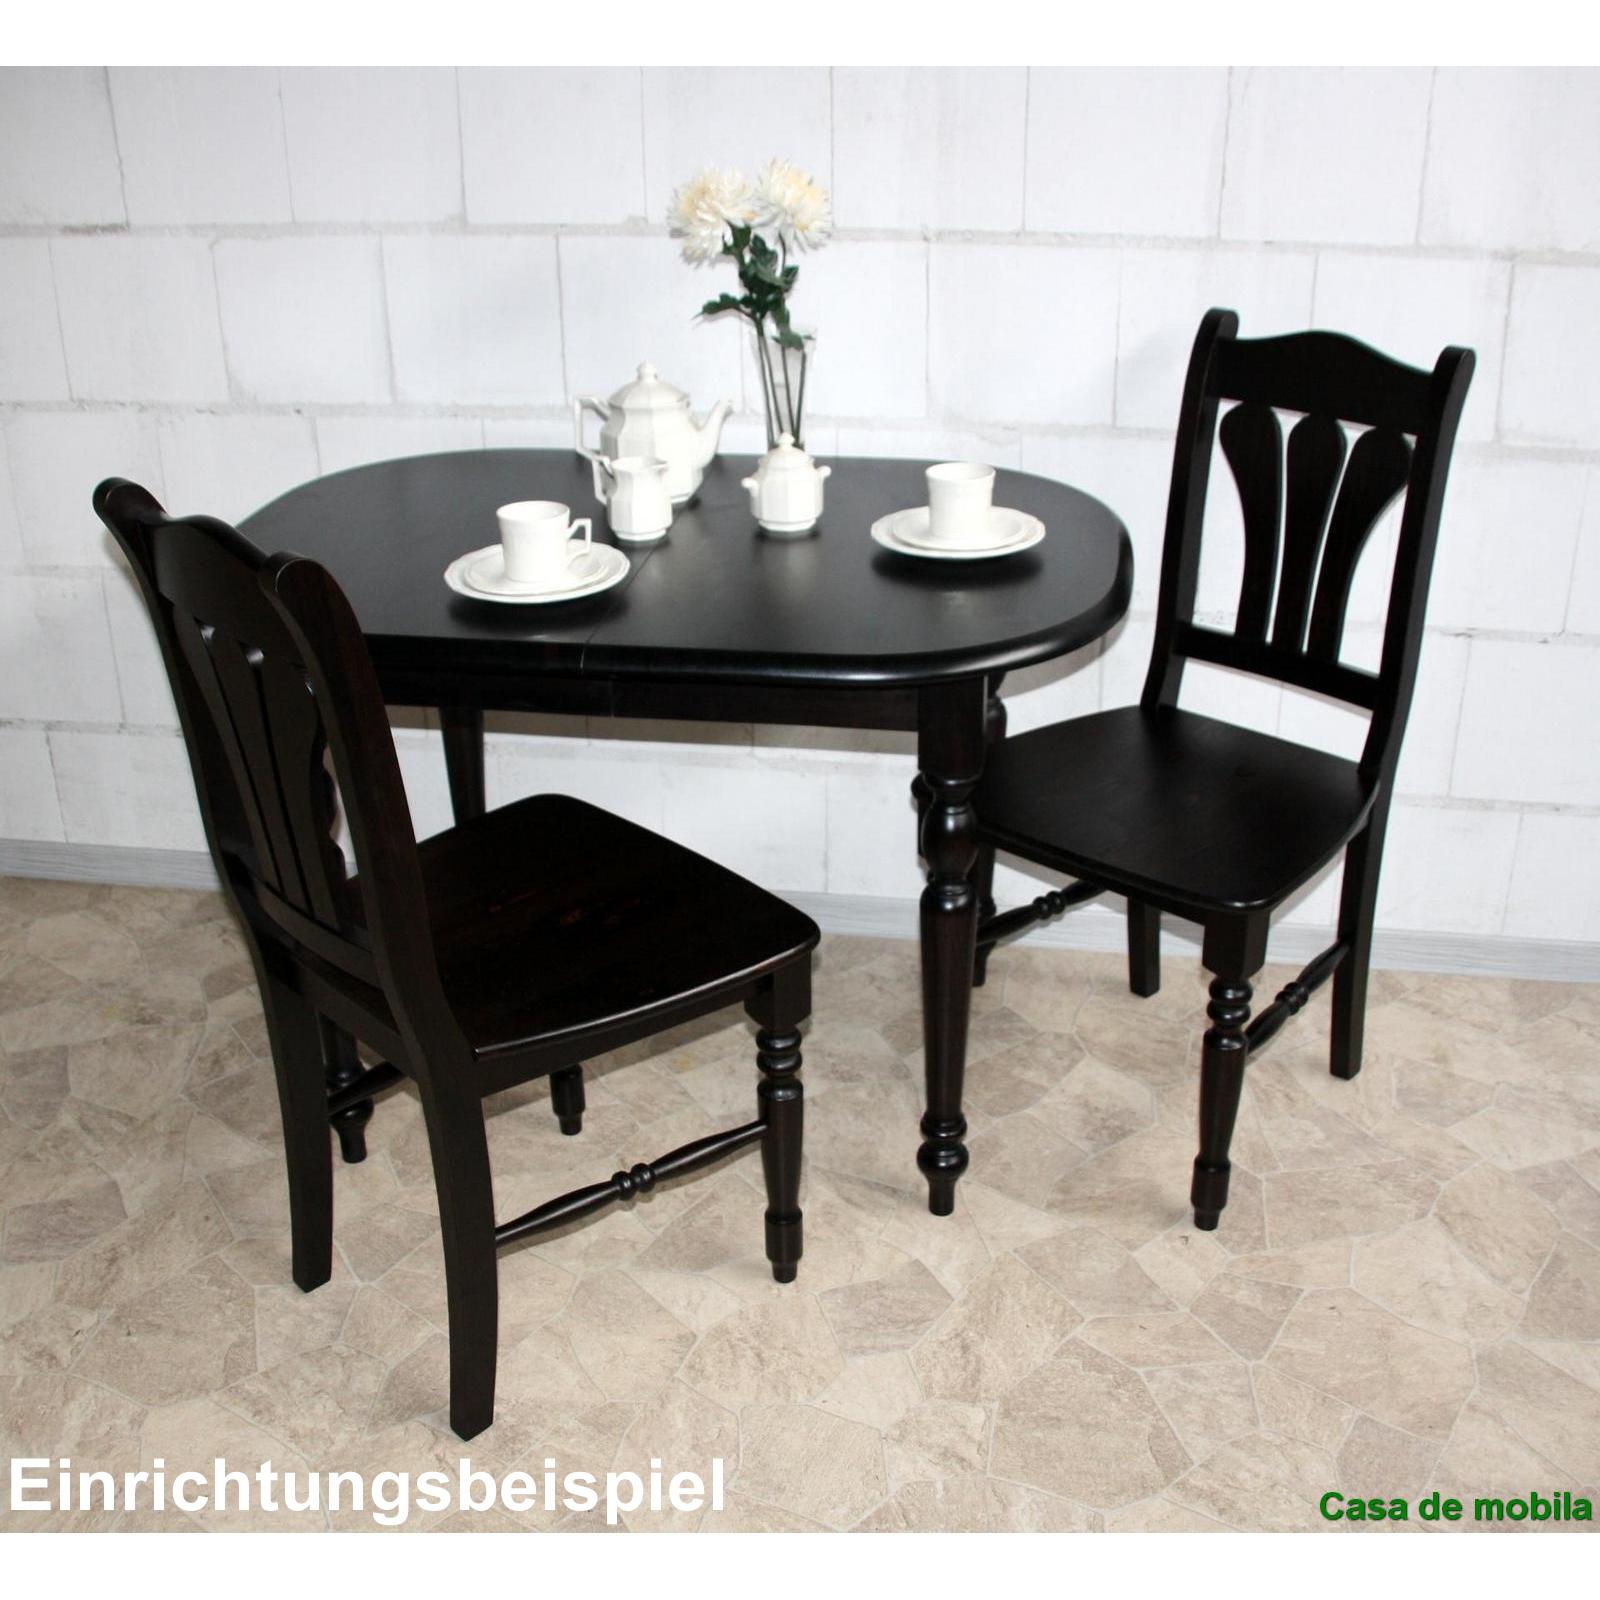 88 kolonialstil wohnzimmer tisch full size of haus. Black Bedroom Furniture Sets. Home Design Ideas